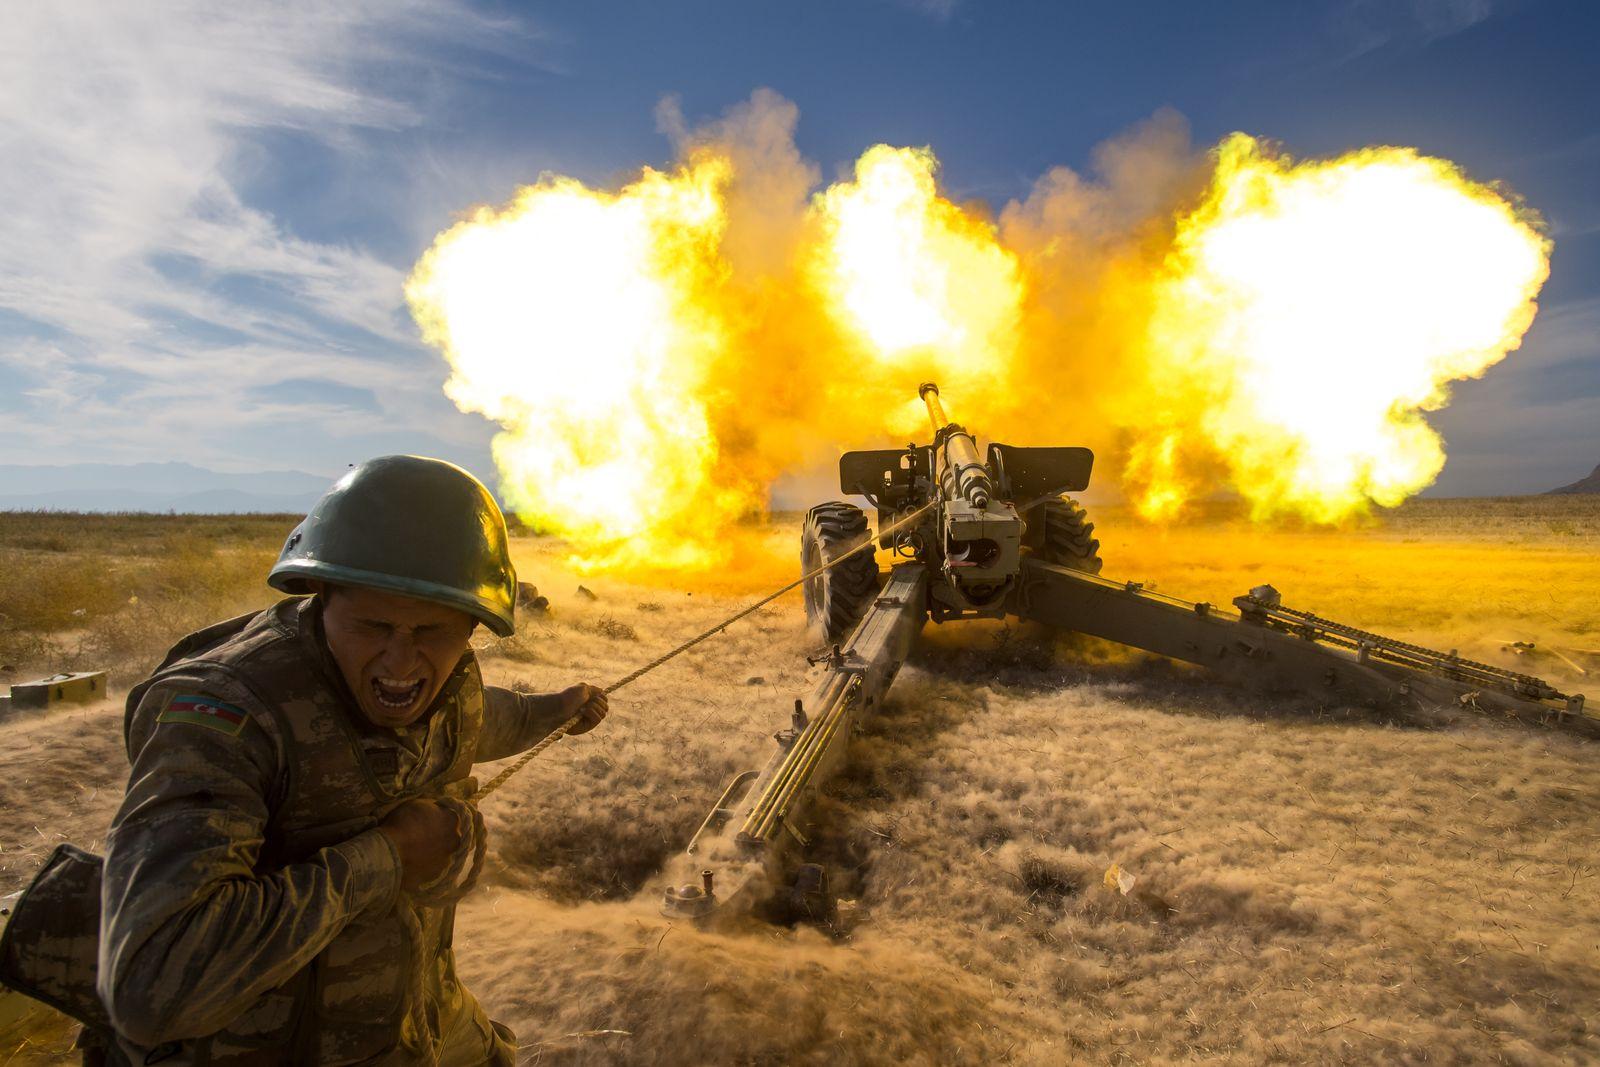 Border clashes between Azerbaijan, Armenia